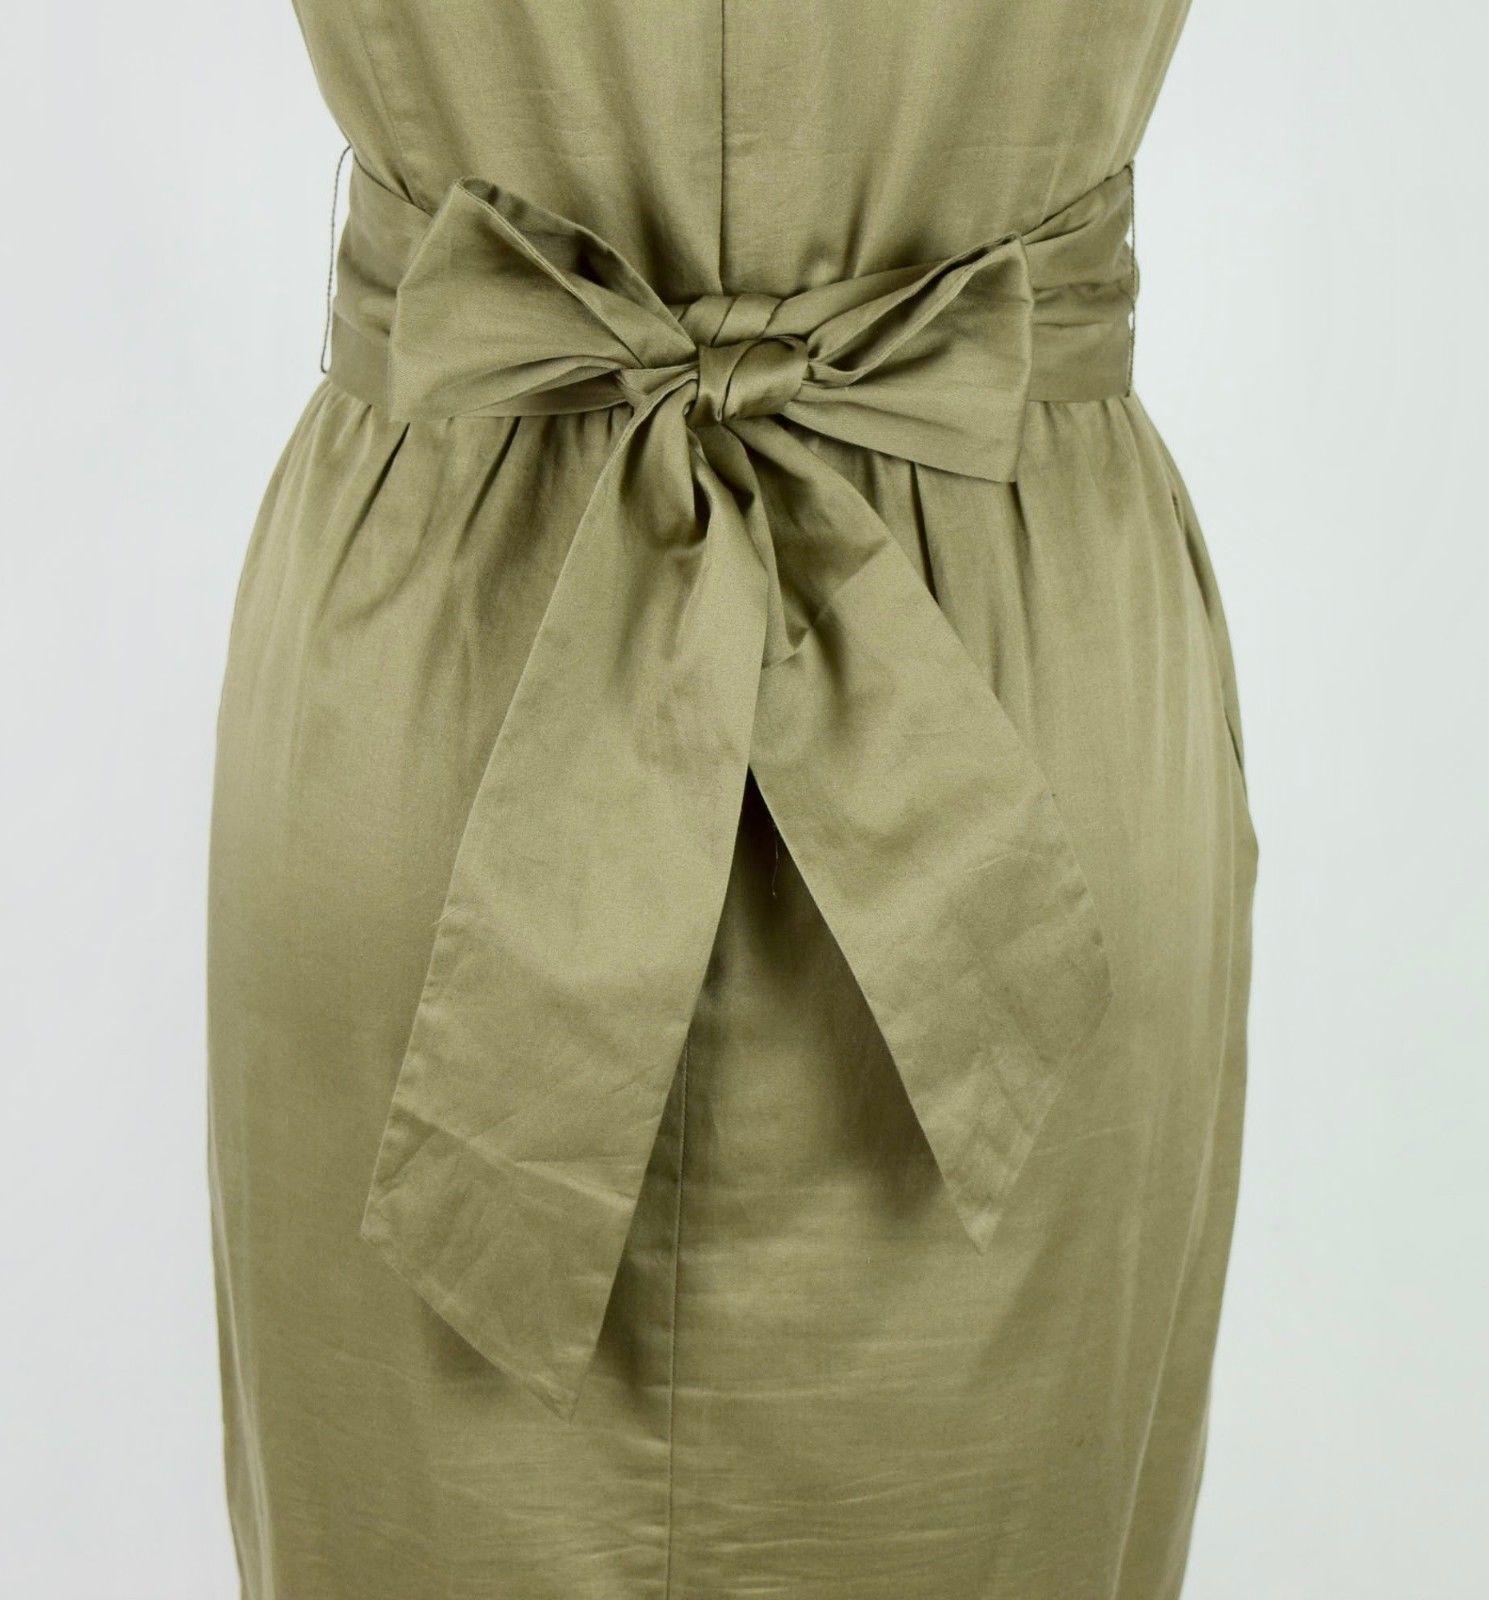 J.Crew Olive Ruffled Cotton Boat Neck Knee Length Shift Dress Sleeveless M image 10